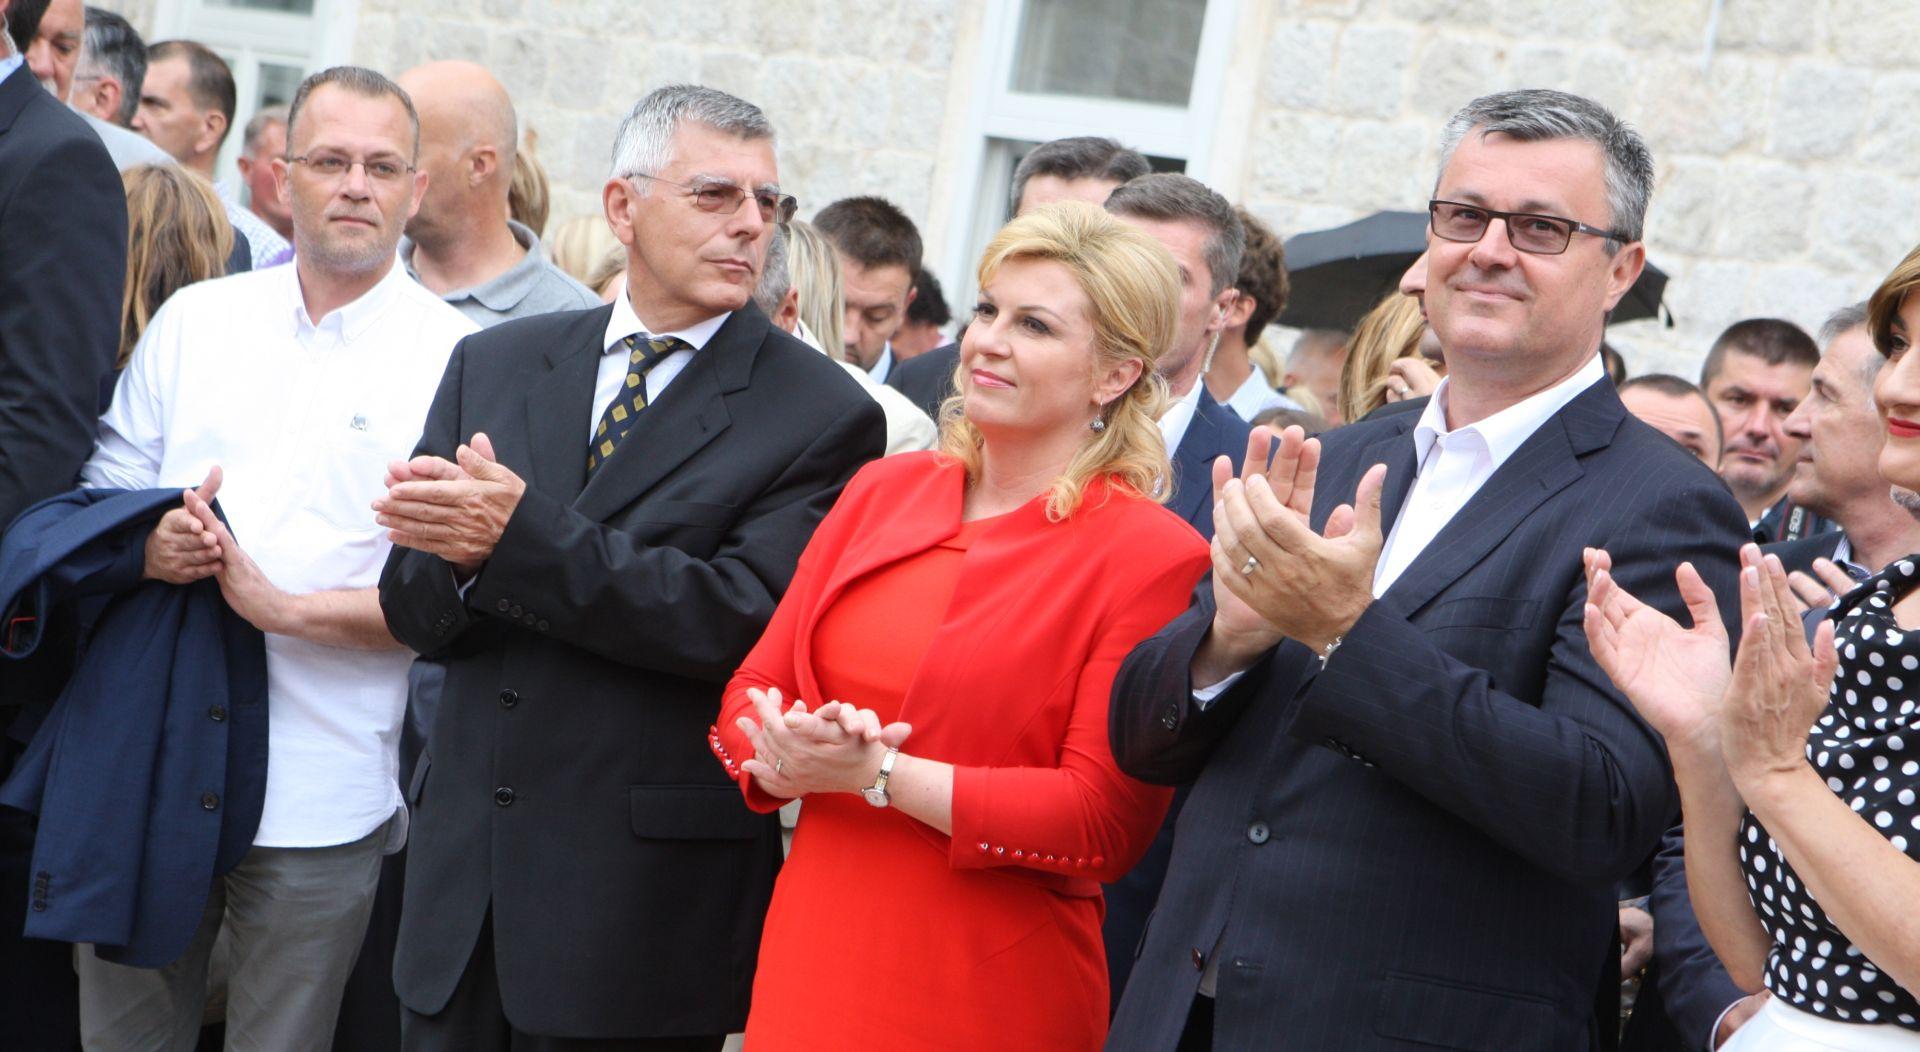 GRABAR KITAROVIĆ 'Očekujem ambicioznu novu hrvatsku Vladu'